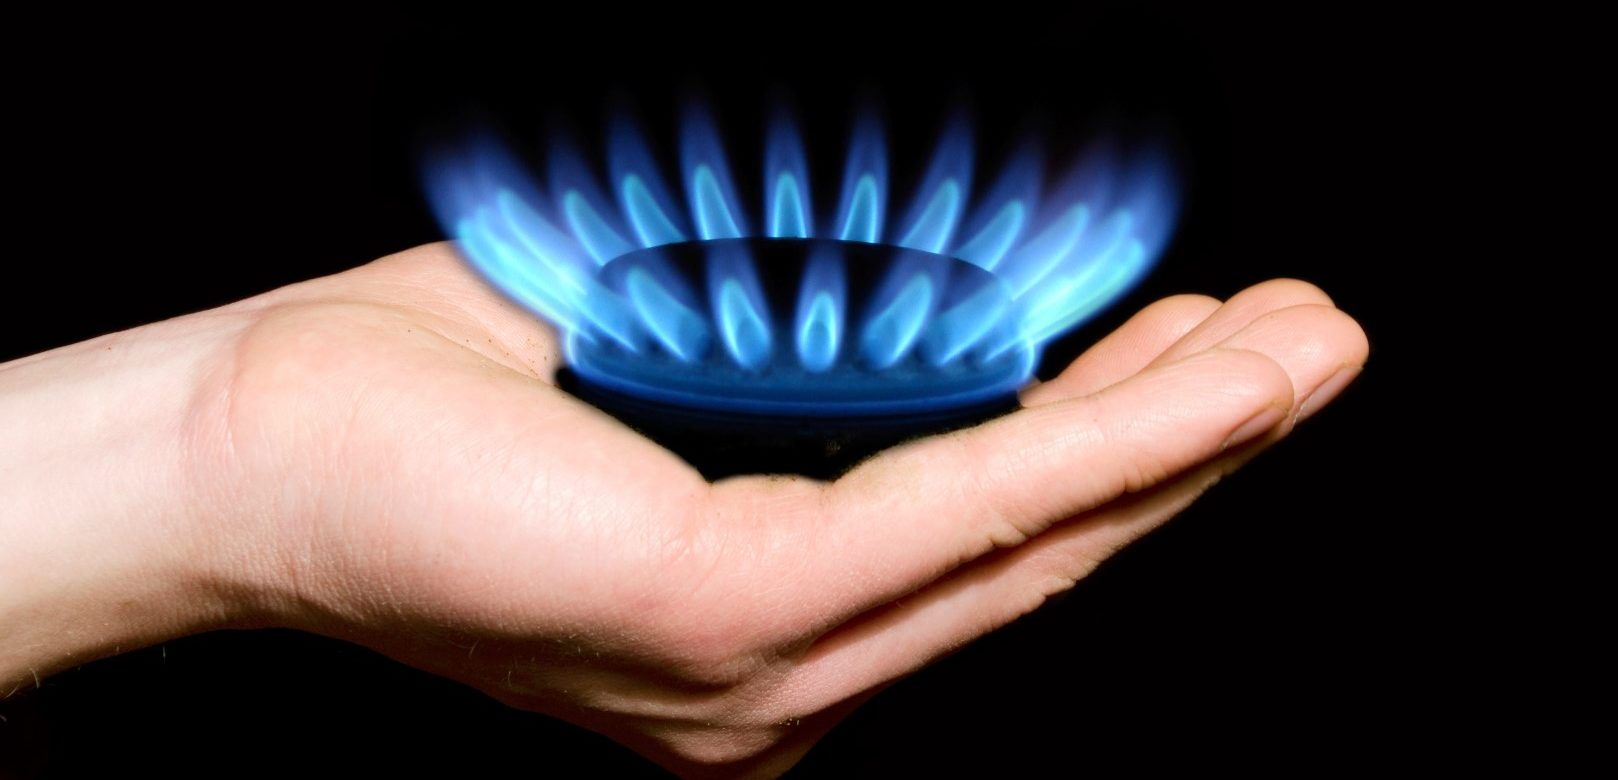 natural-gas-Large-e1473720448386.jpg